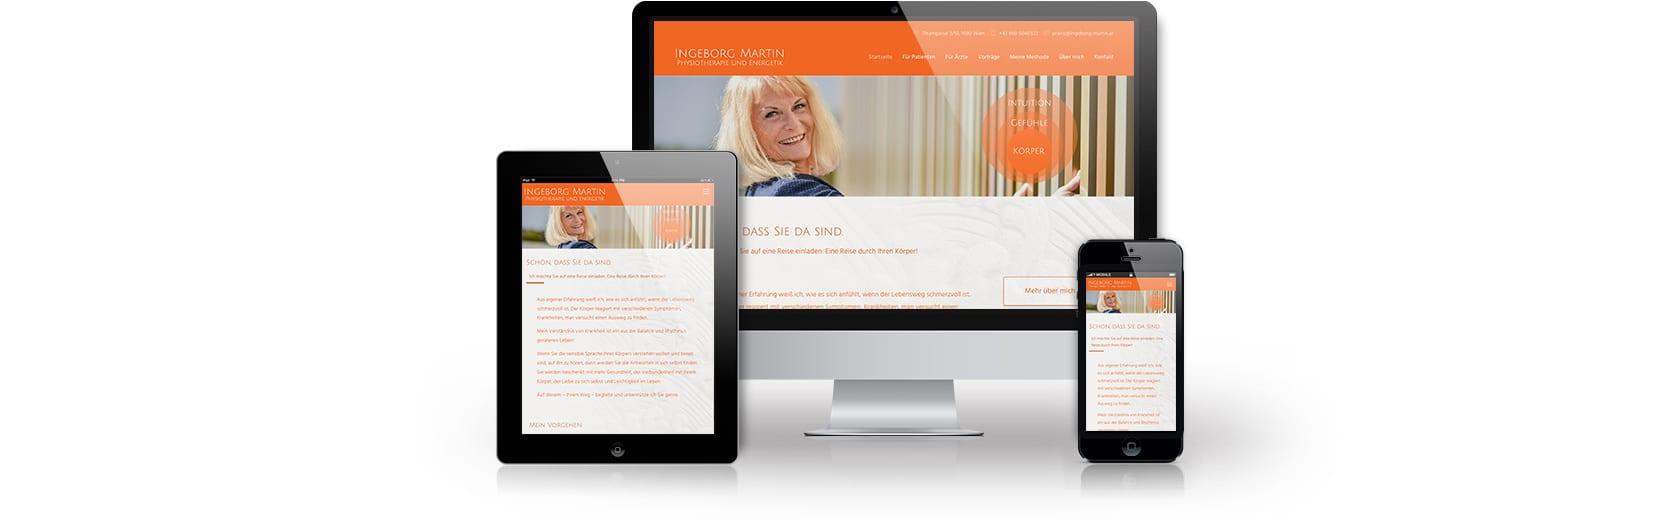 Neue Website designen lassen